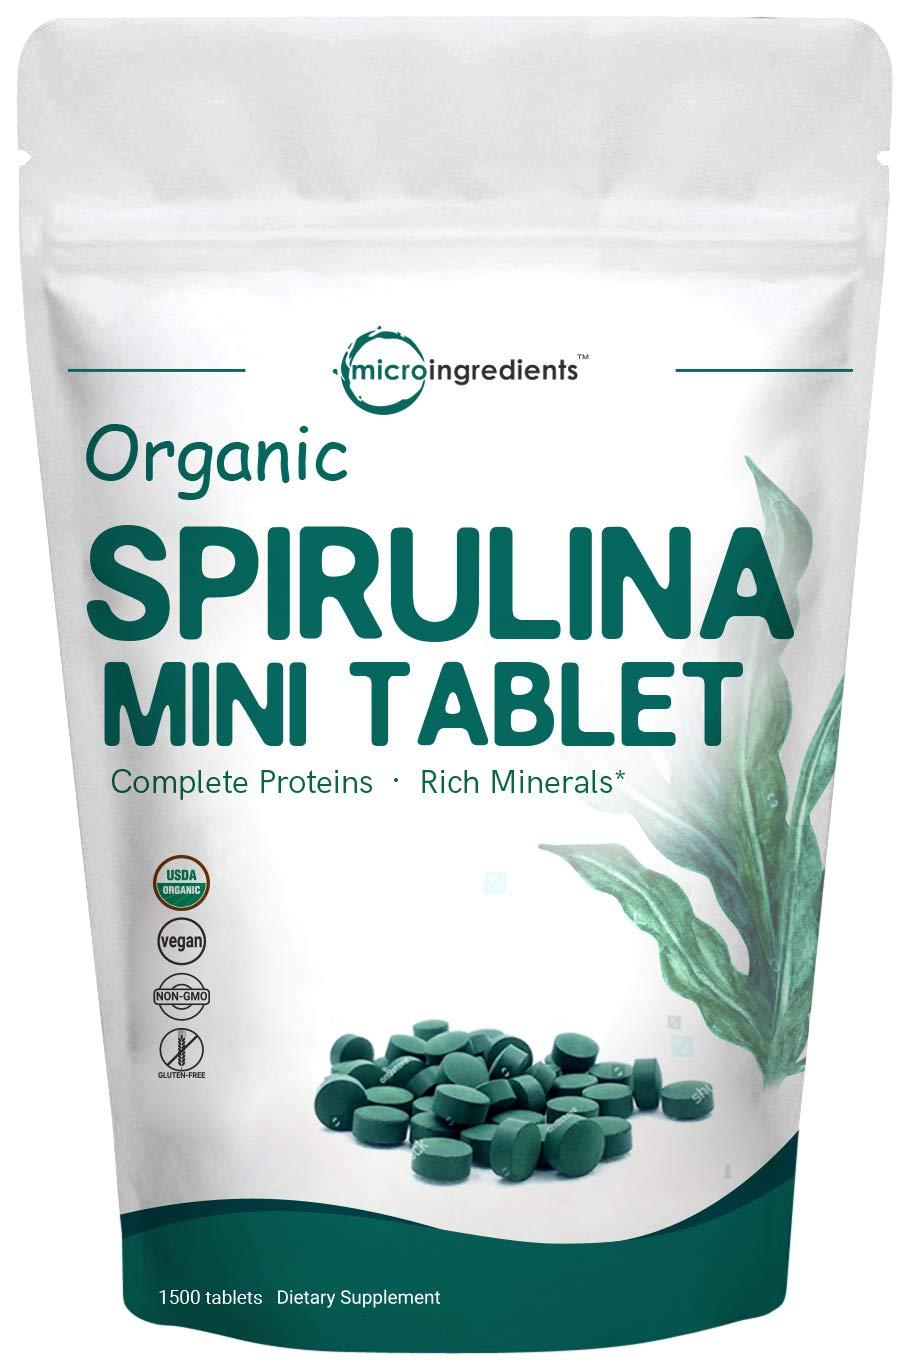 Organic Spirulina 3000mg Per Serving,1500 Tablet, Best Superfoods for Rich Minerals, Vitamins, Chlorophyll, Amino Acids, Fatty Acids, Fiber & Proteins, Non-GMO & Vegan Friendly